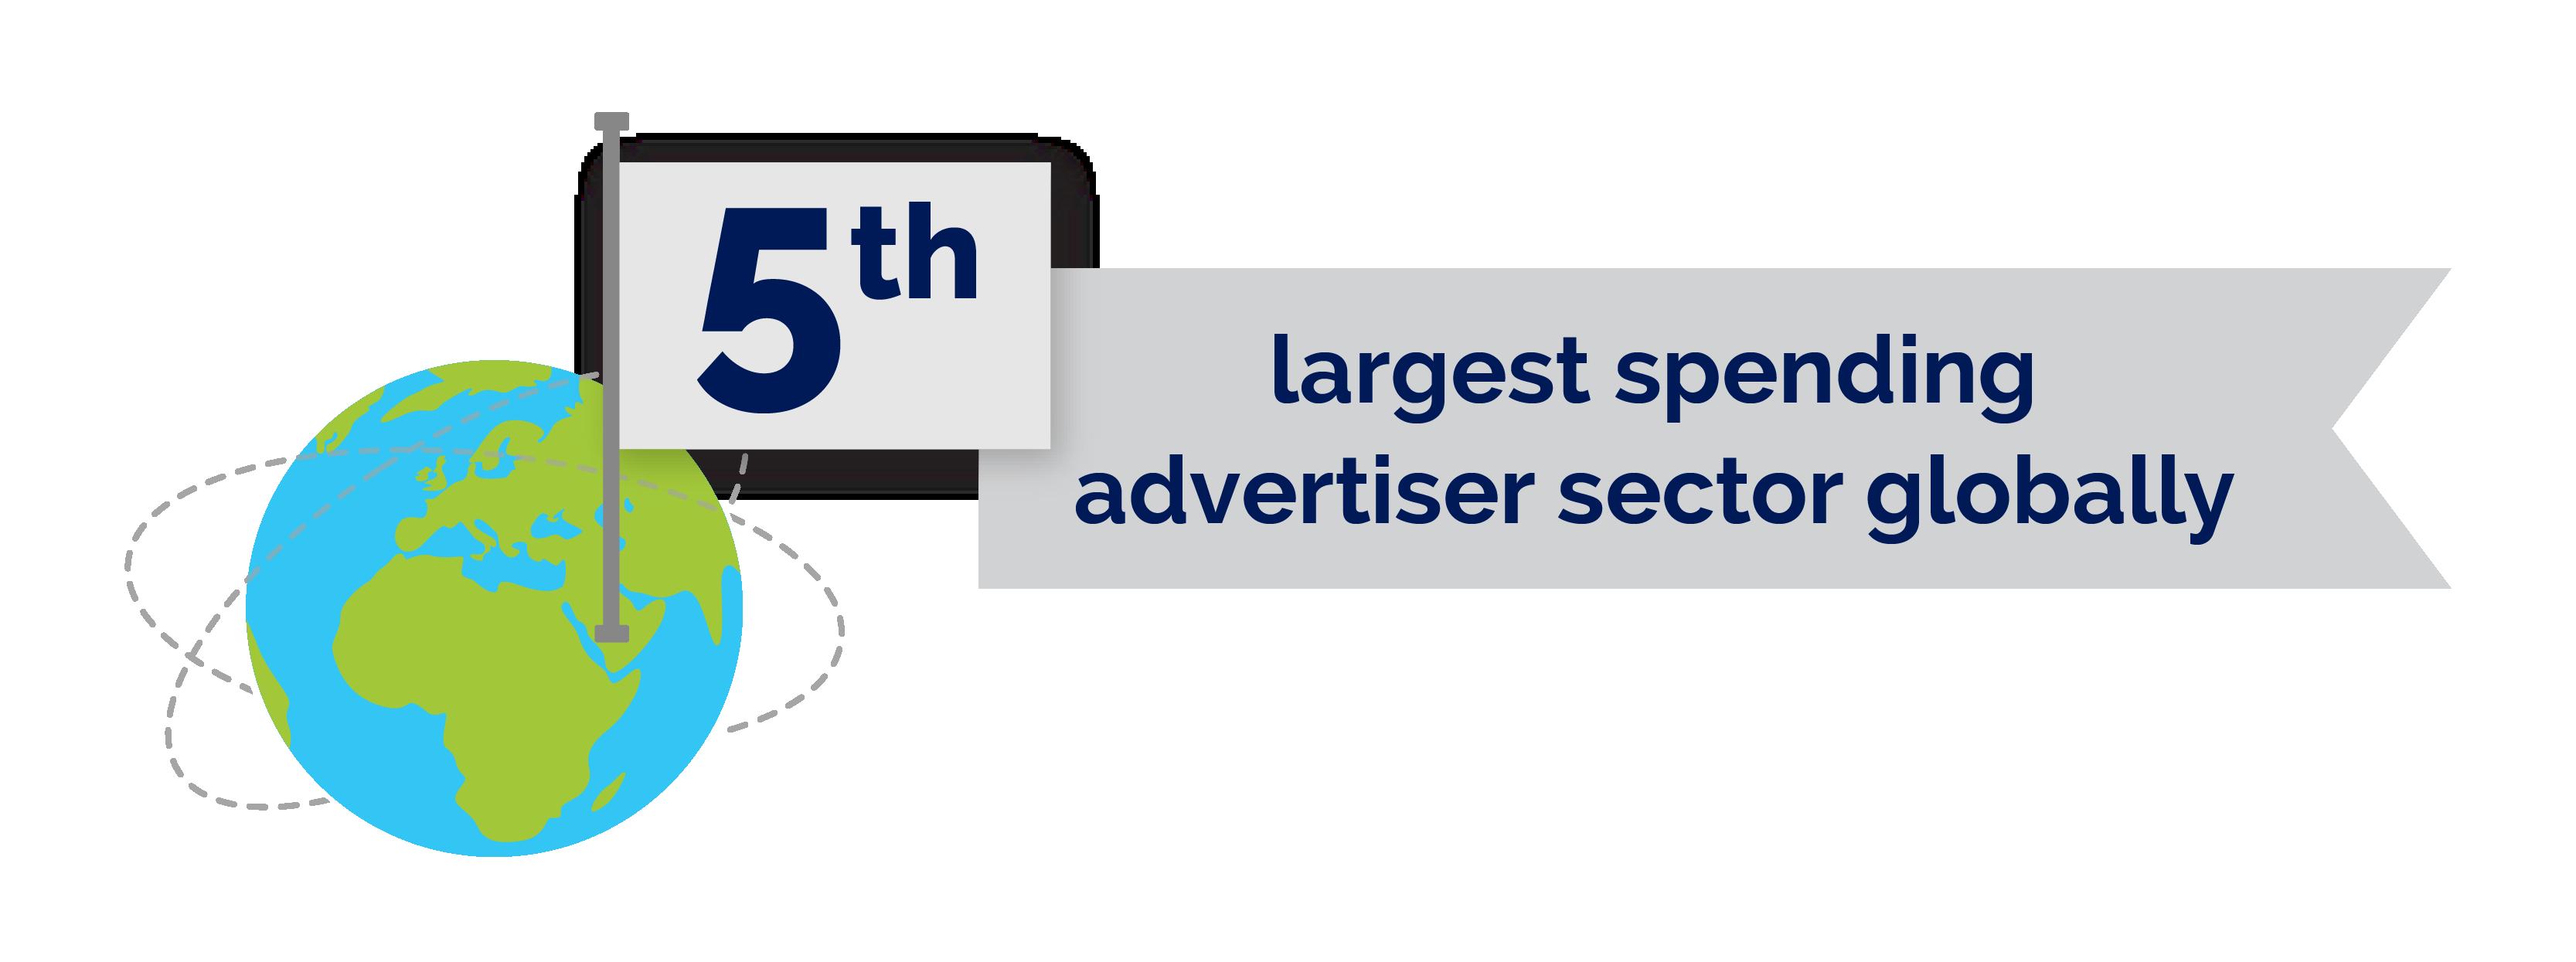 FMCG 5th largest spending advertiser sector